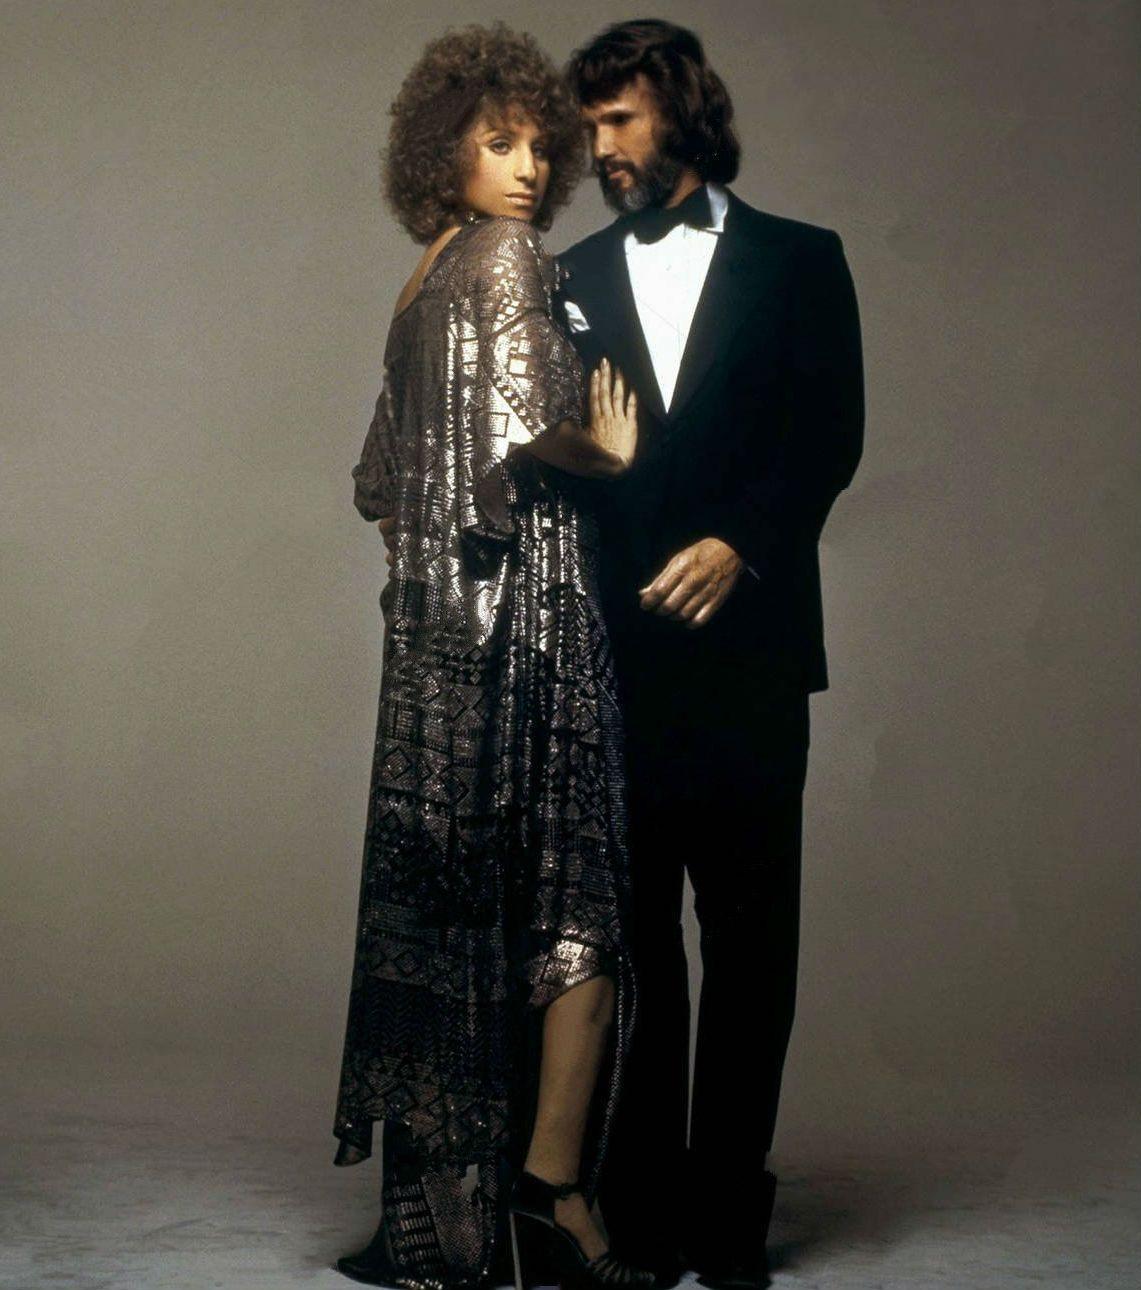 Barbra Streisand Kris Kristofferson In A Star Is Born With